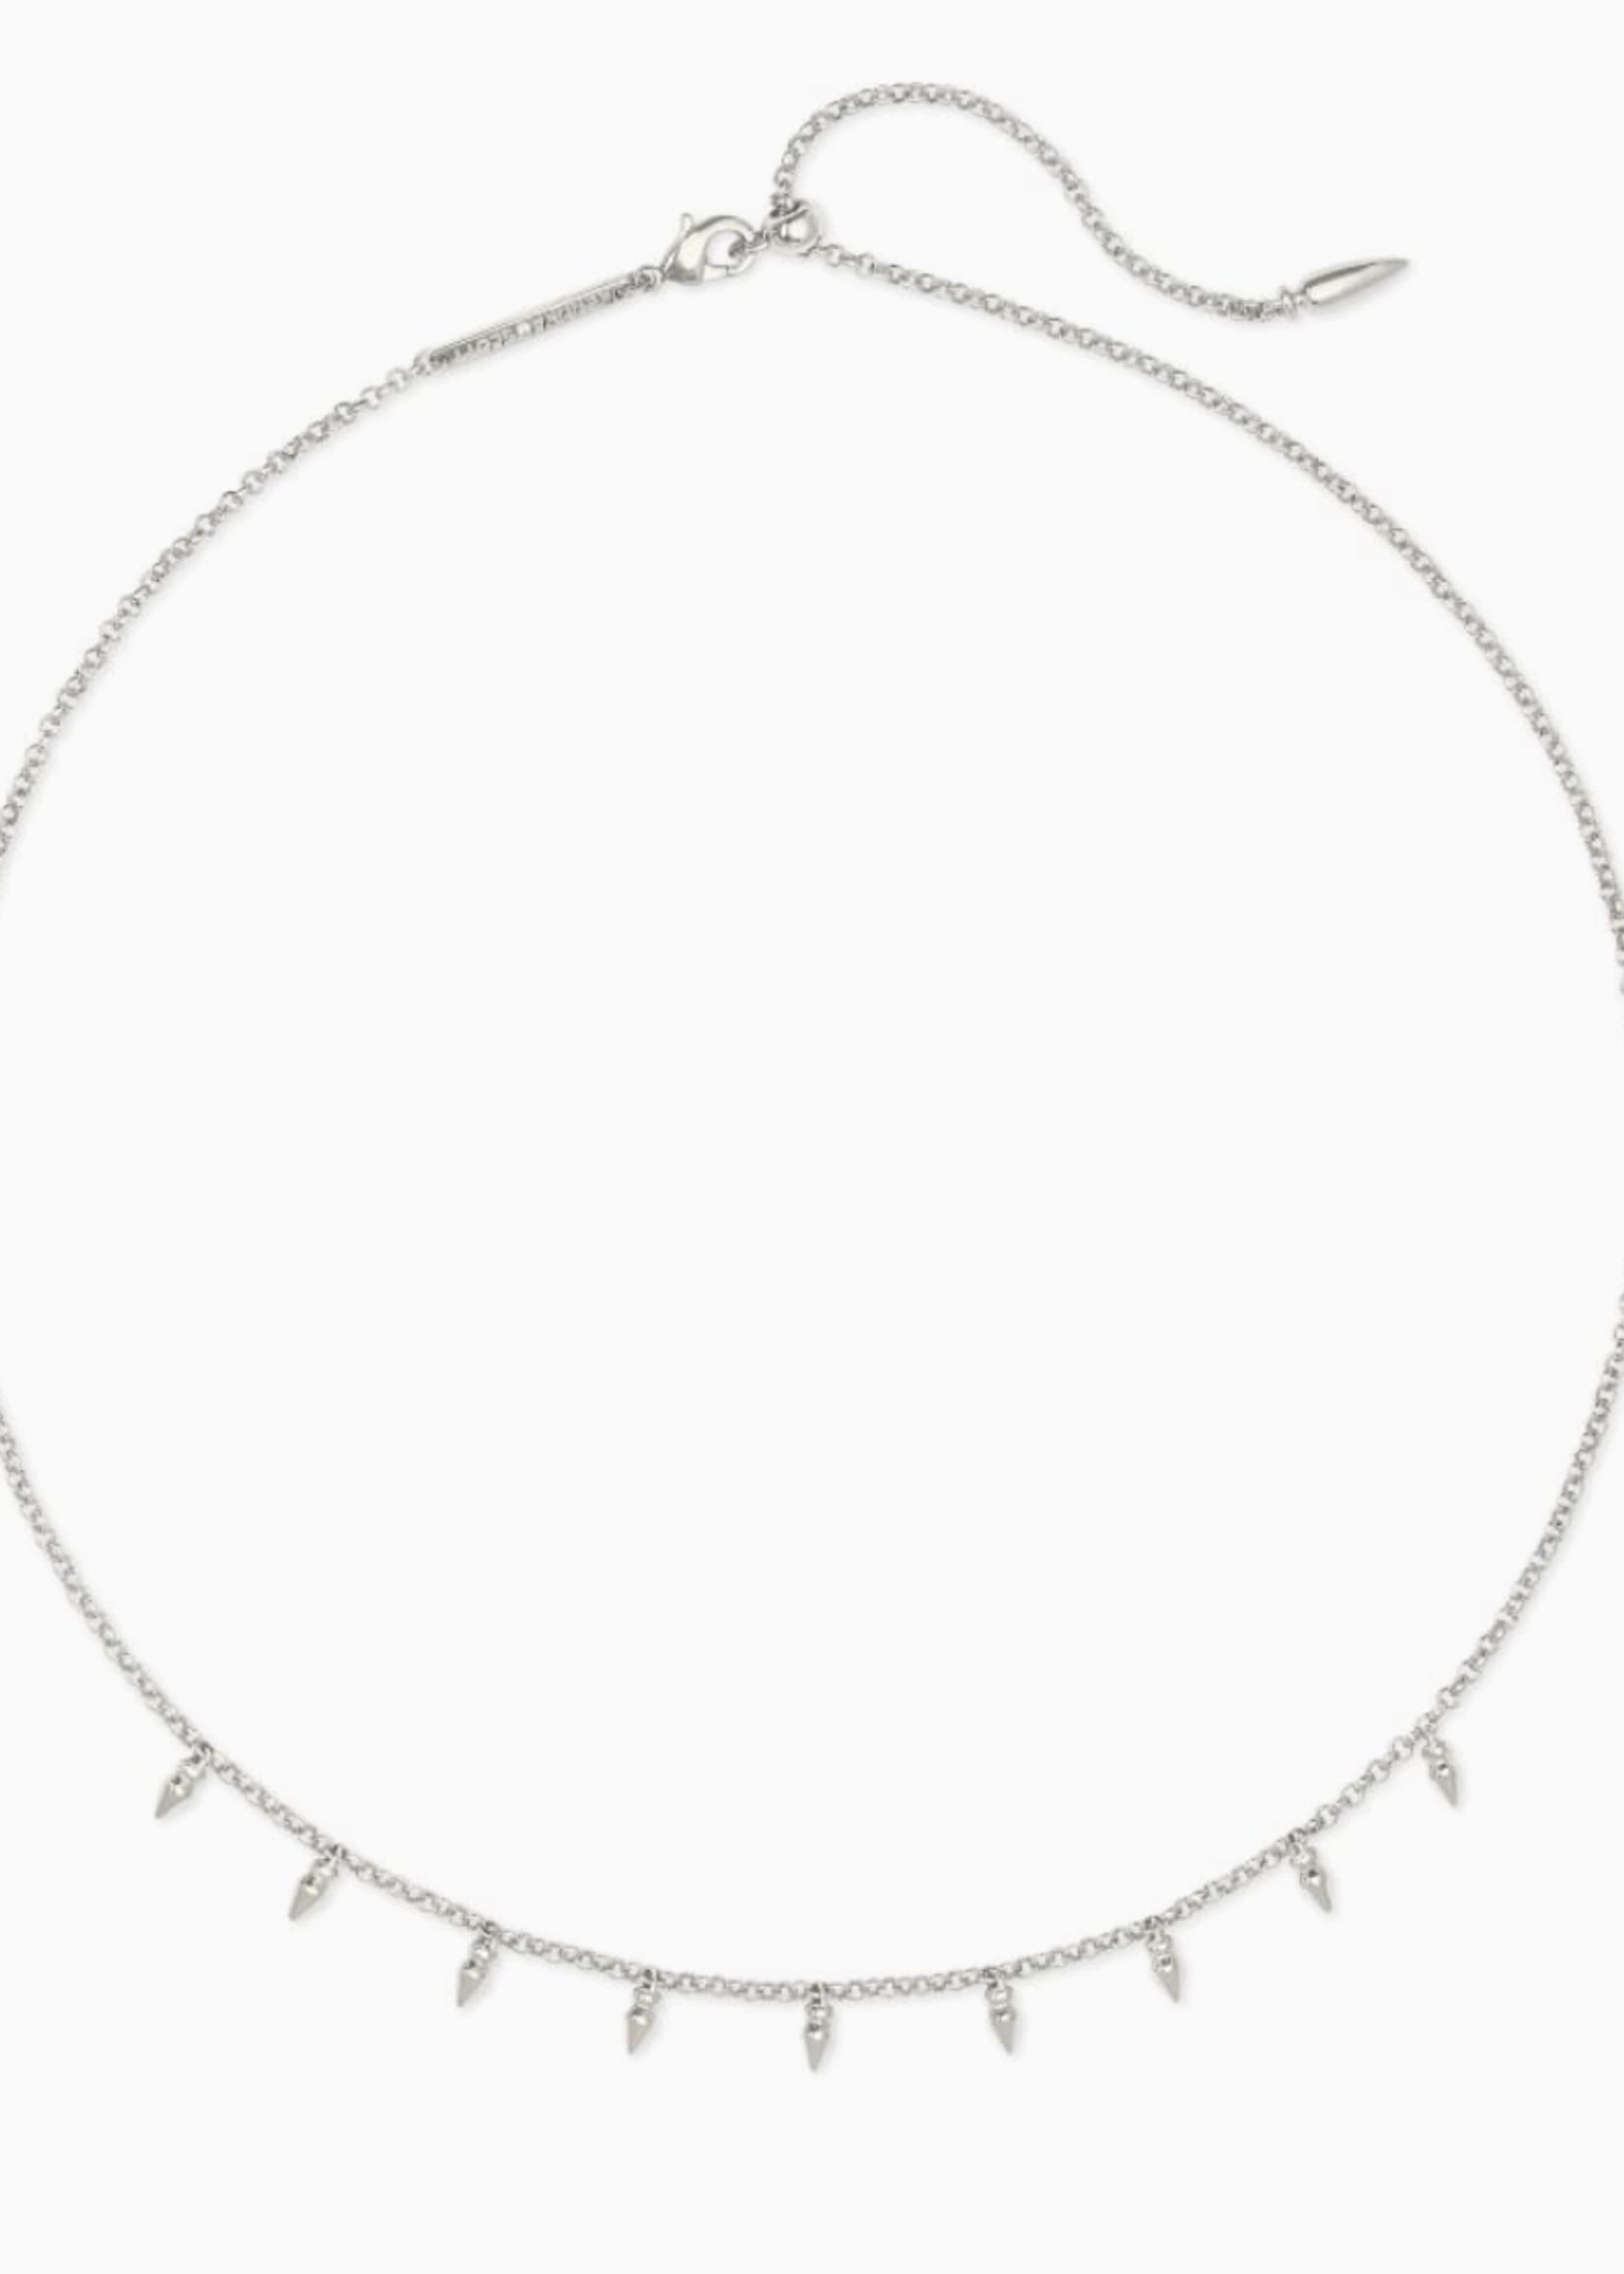 Kendra Scott Kendra Scott Addison Necklace Silver